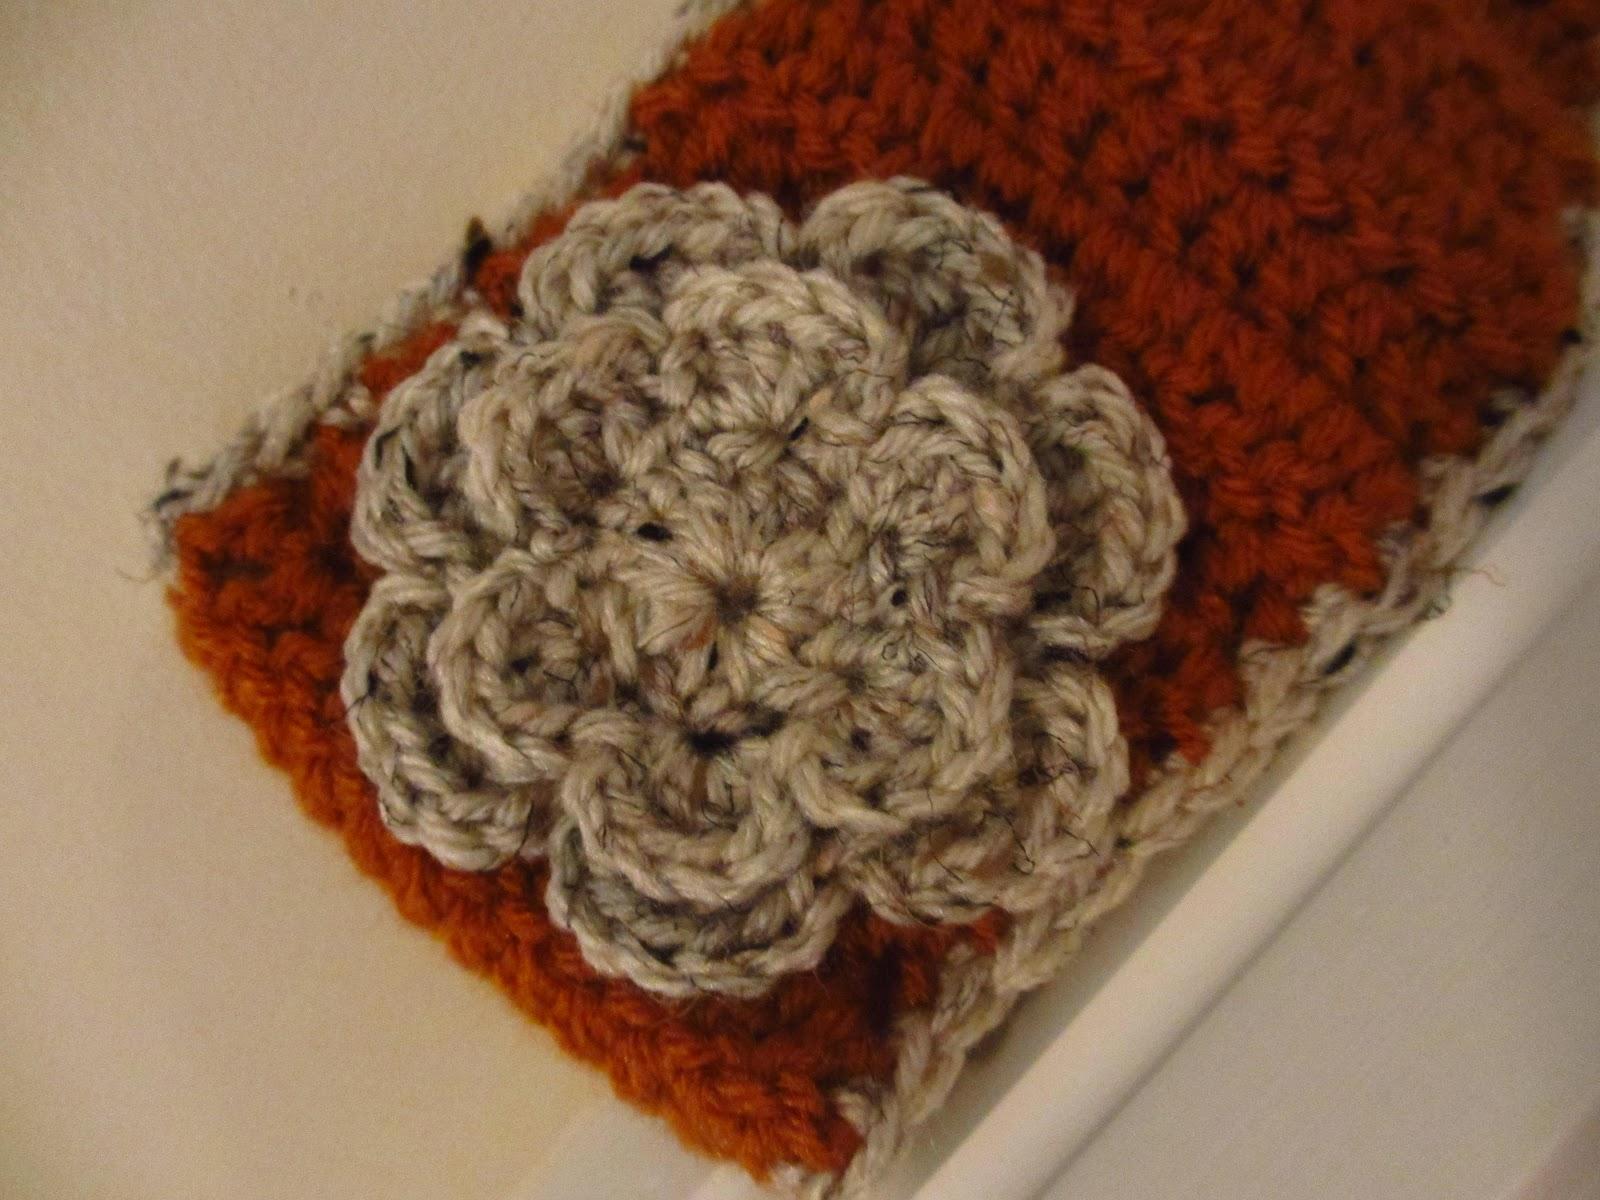 Jays boutique blog free pattern bordered headwrap with flower free pattern bordered headwrap with flower bankloansurffo Choice Image